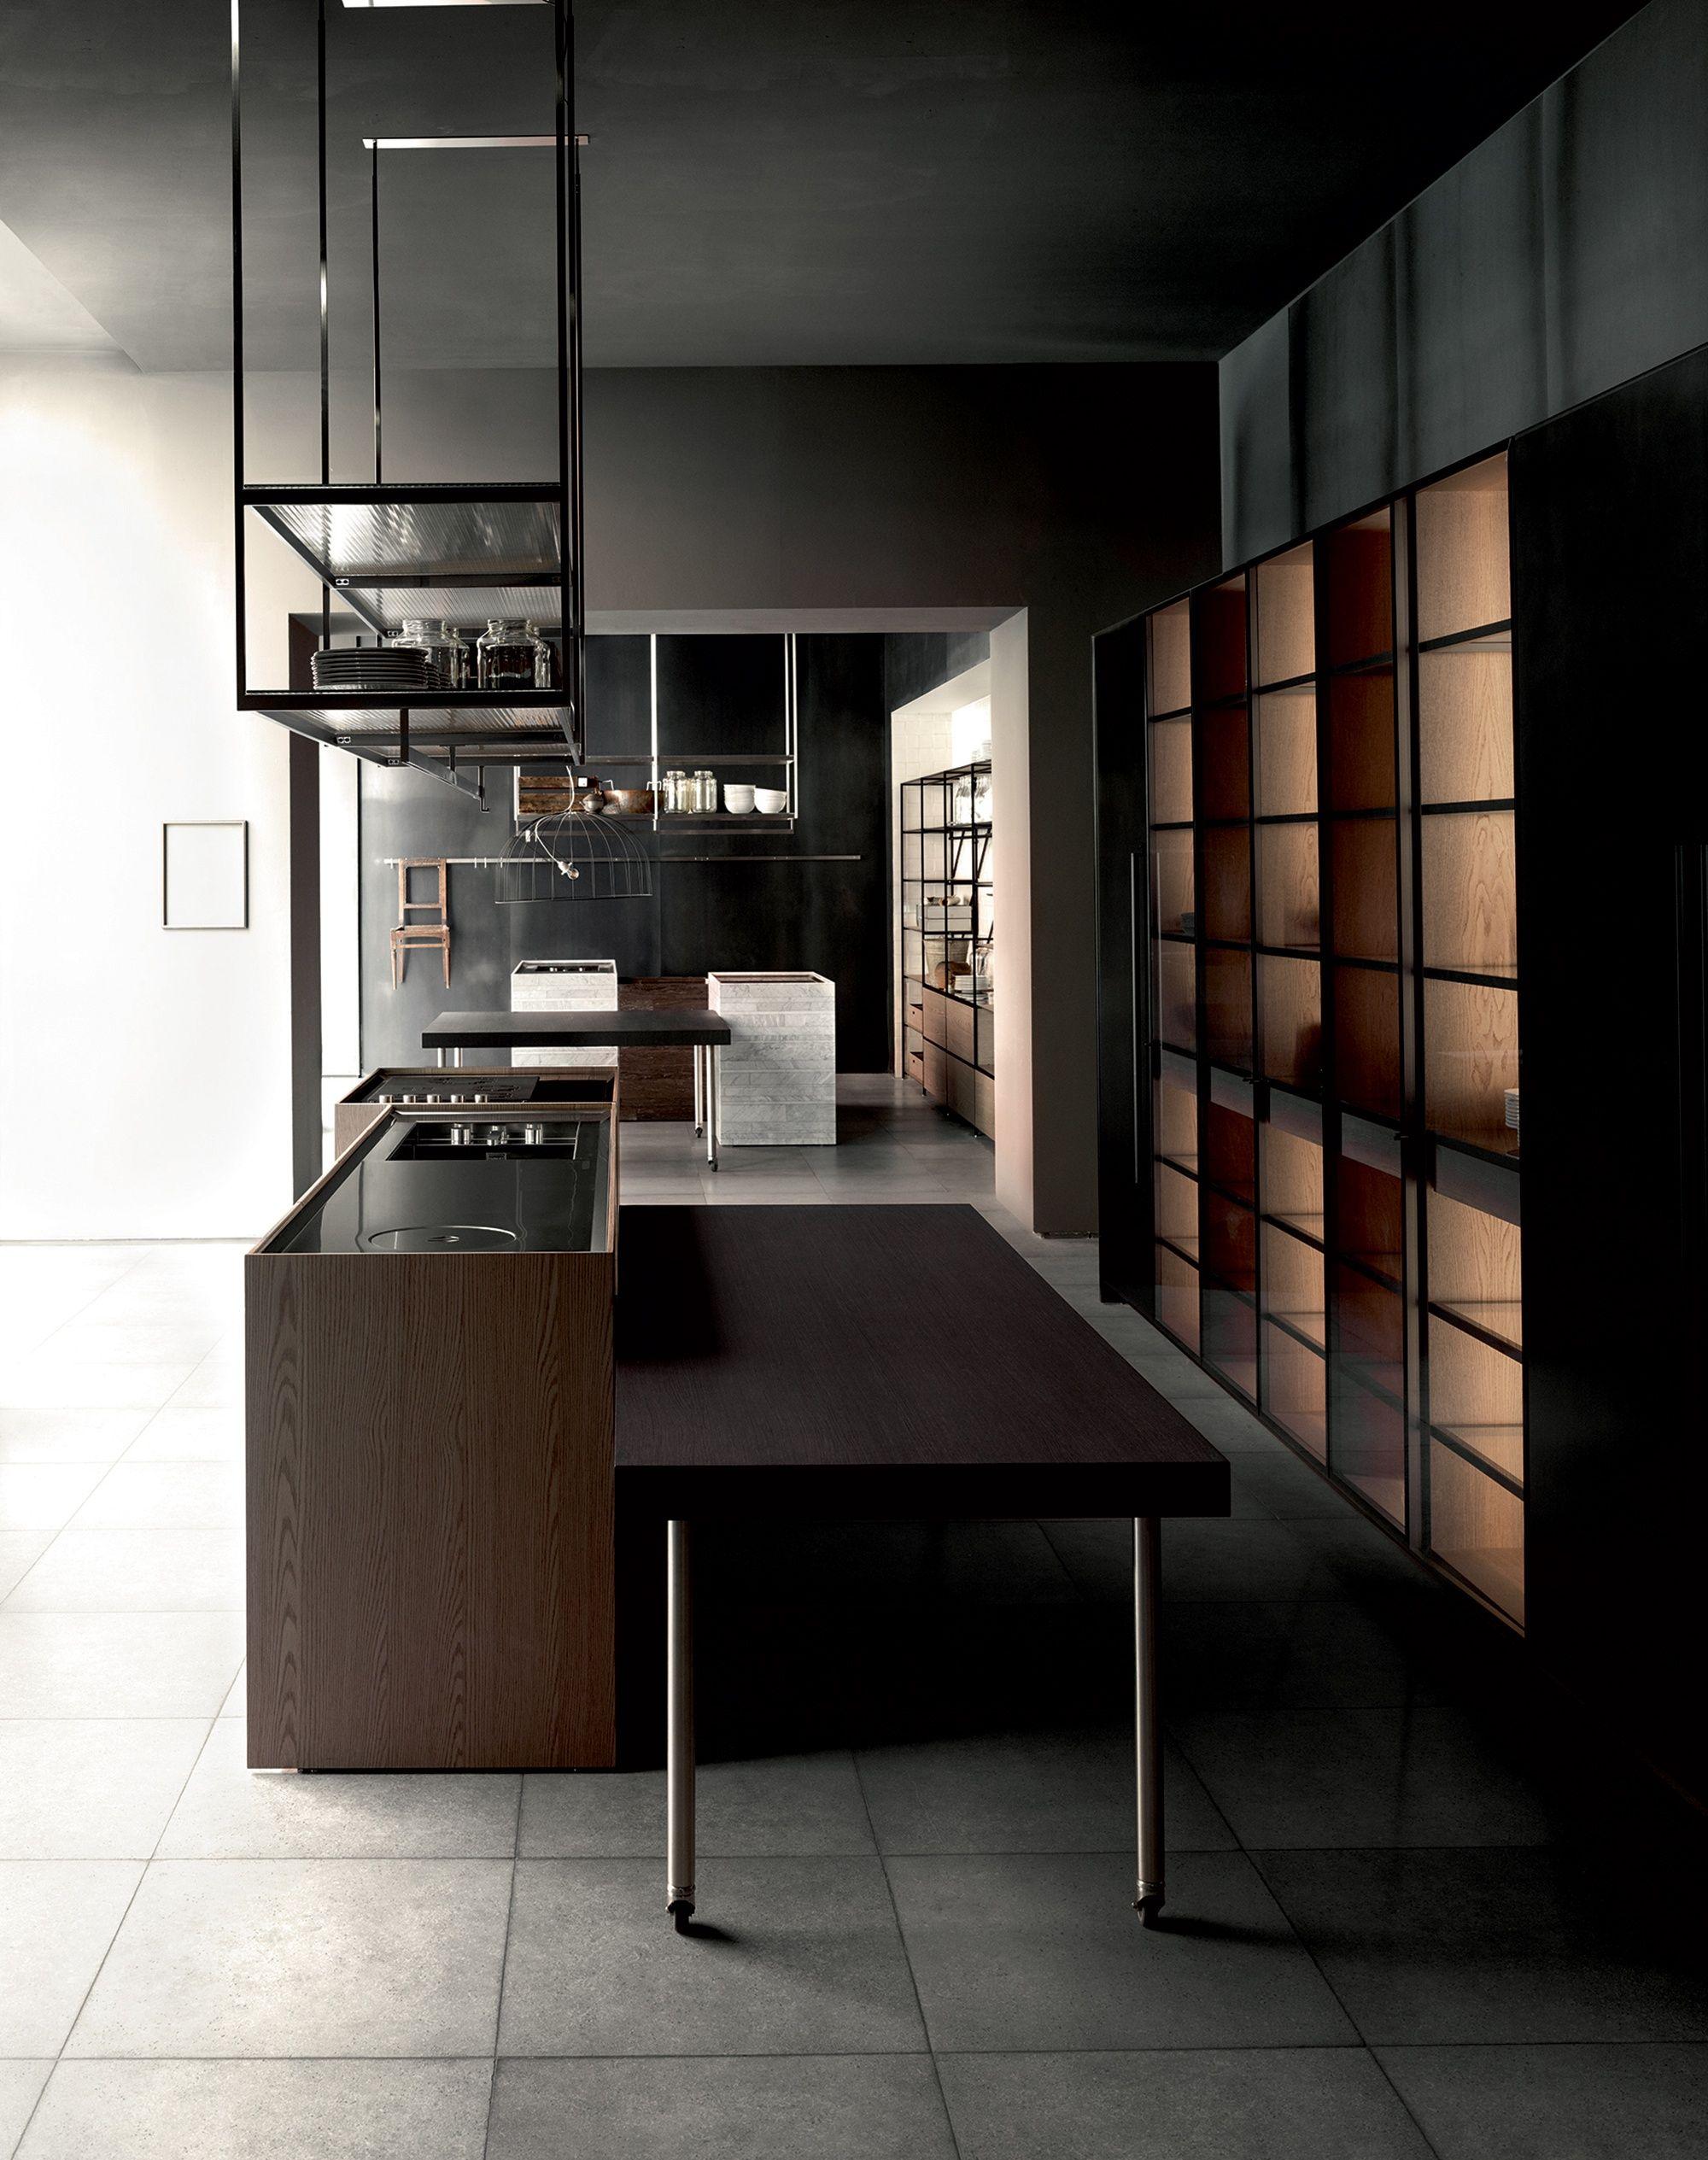 Boffi   Combine Kitchen / by Piero Lissoni / Ph. Tommaso Sartori in 2020 With images ...